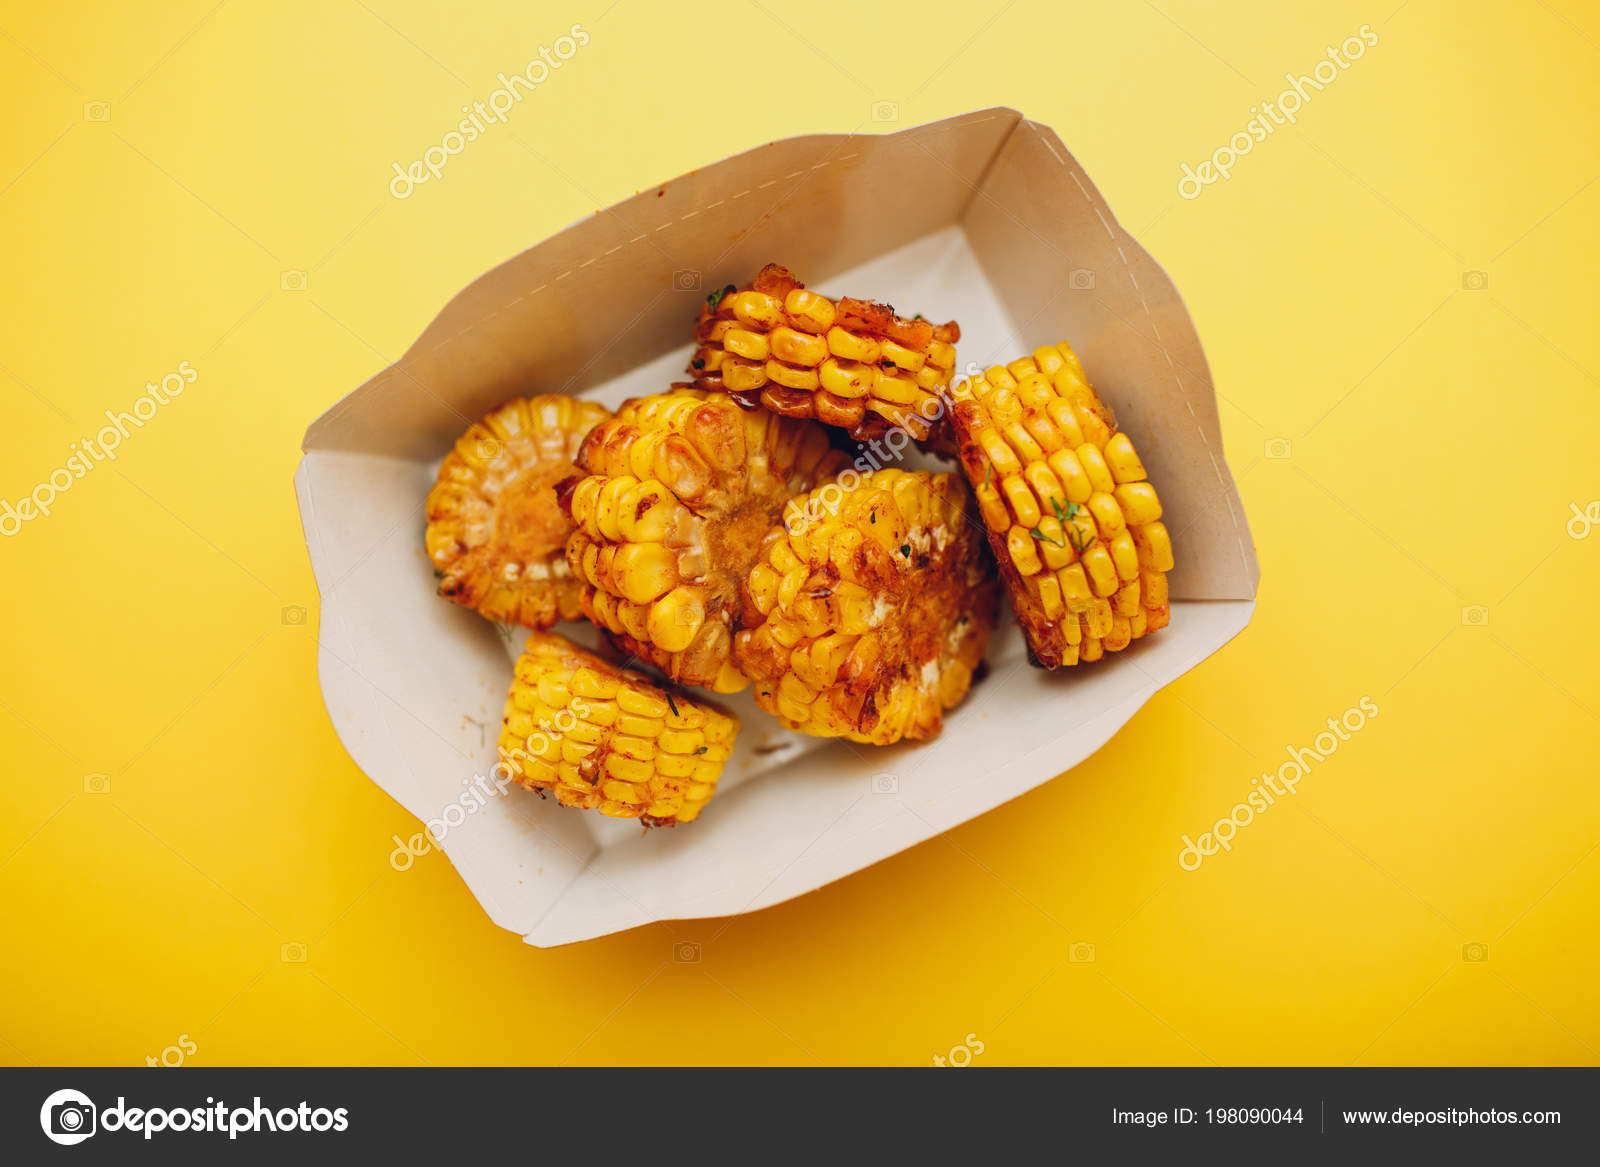 Food Court Concept Sweet Corn — Stock Photo © atercorv gmail